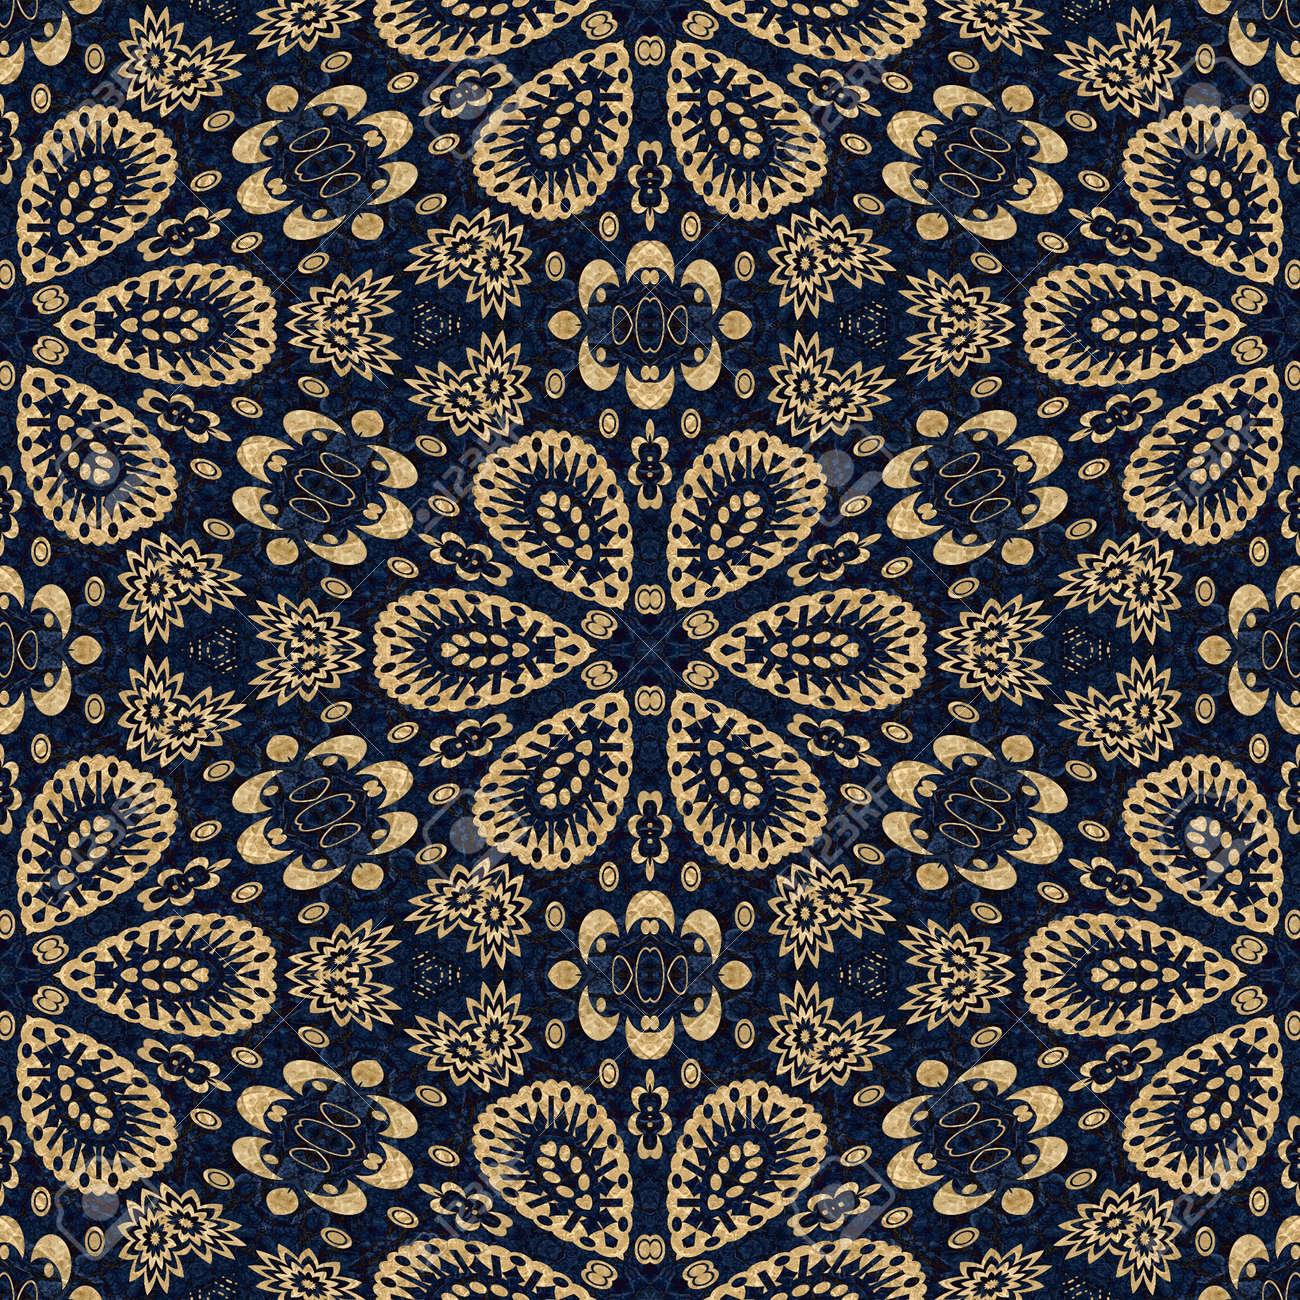 art vintage damask seamless pattern background Stock Photo - 13984910